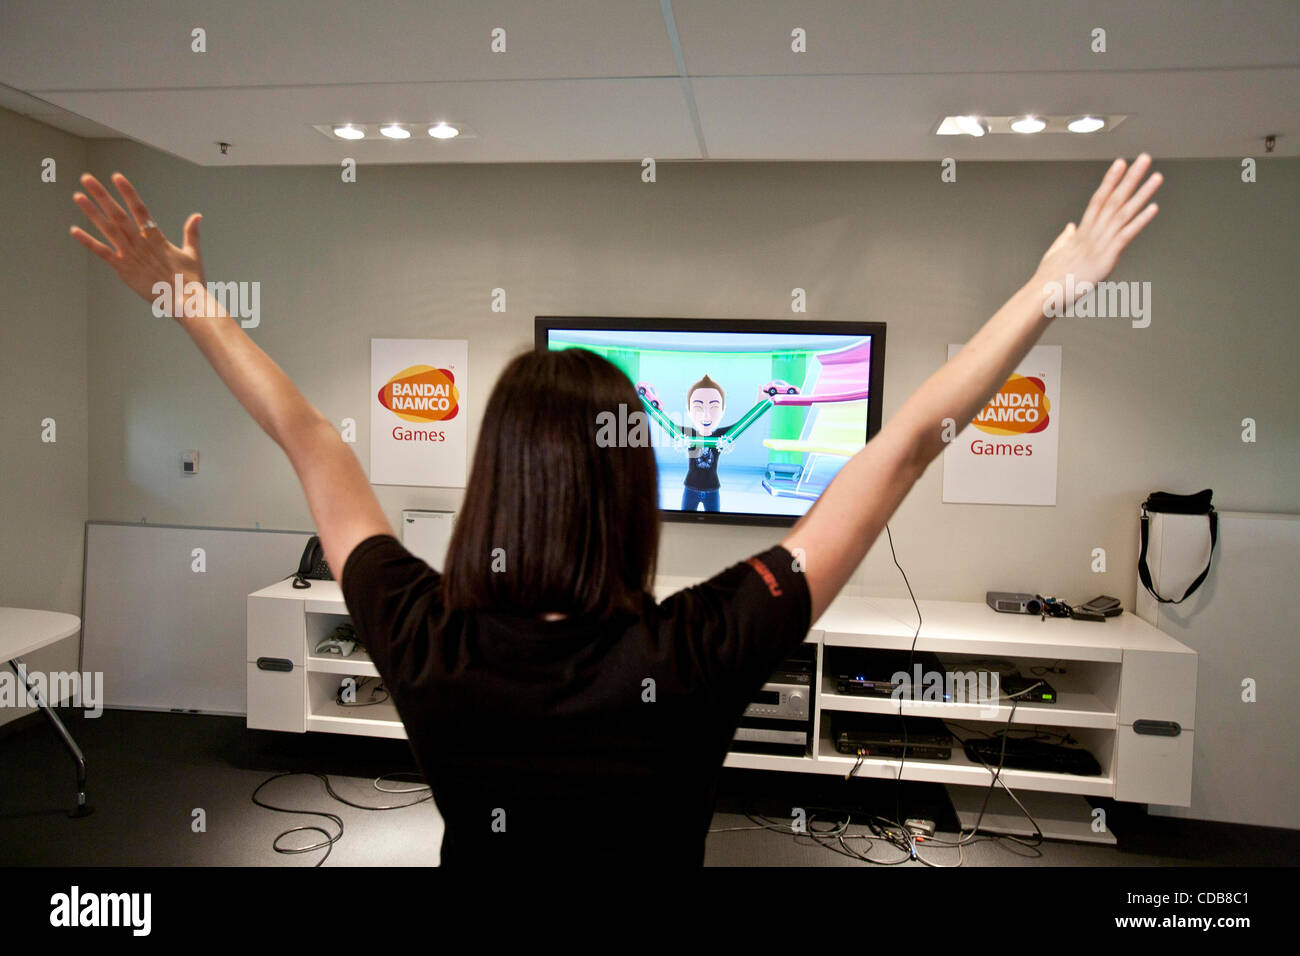 Dec. 6, 2010 - Santa Clara, California, U.S. - KATHERINE SCHILLING, 26, a Localization Specialist with Namco Bandai - Stock Image